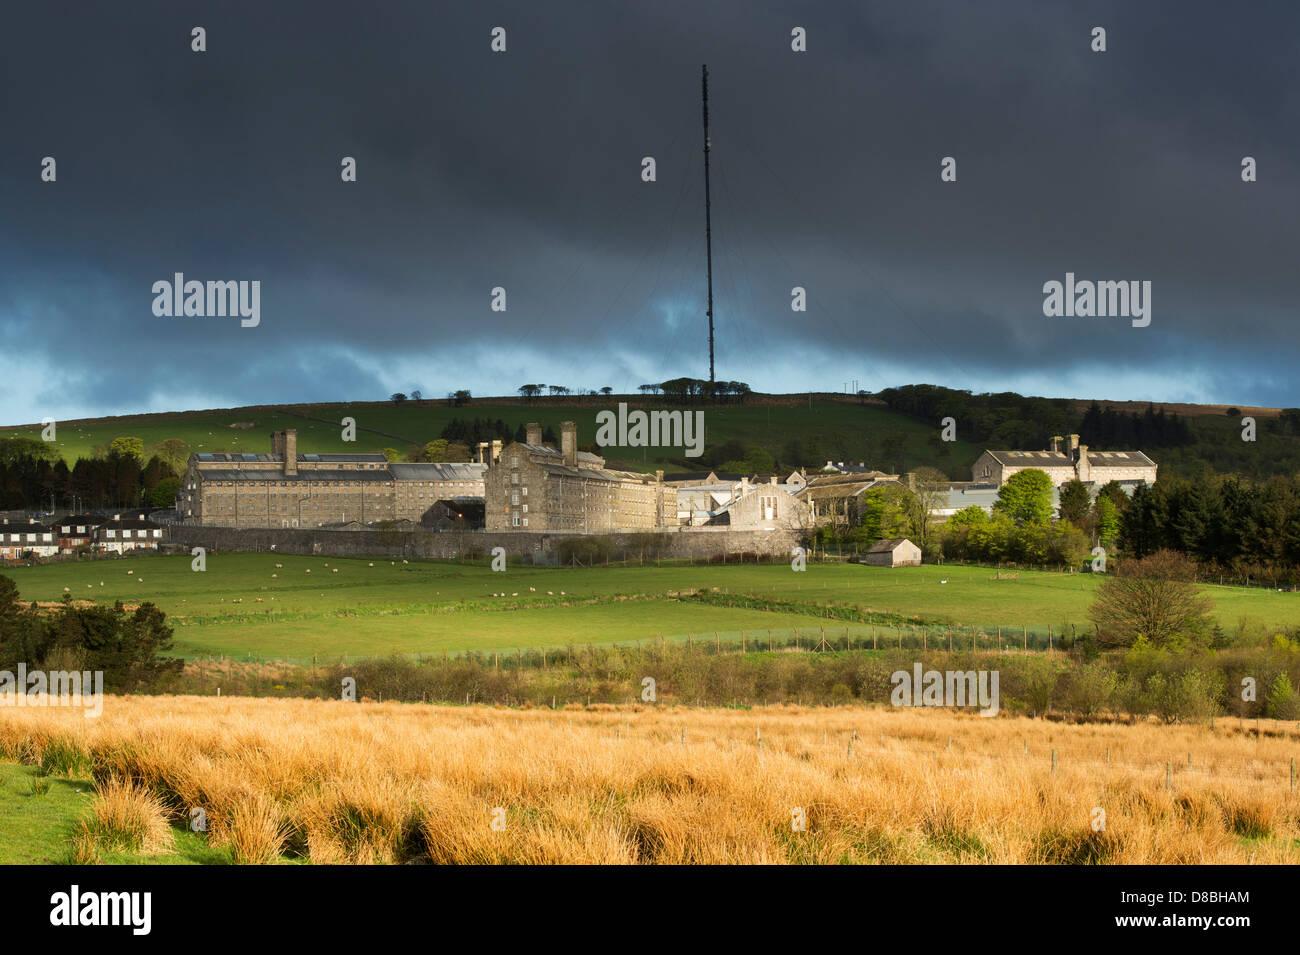 HM Prison Dartmoor against a stormy sky. Devon, England - Stock Image